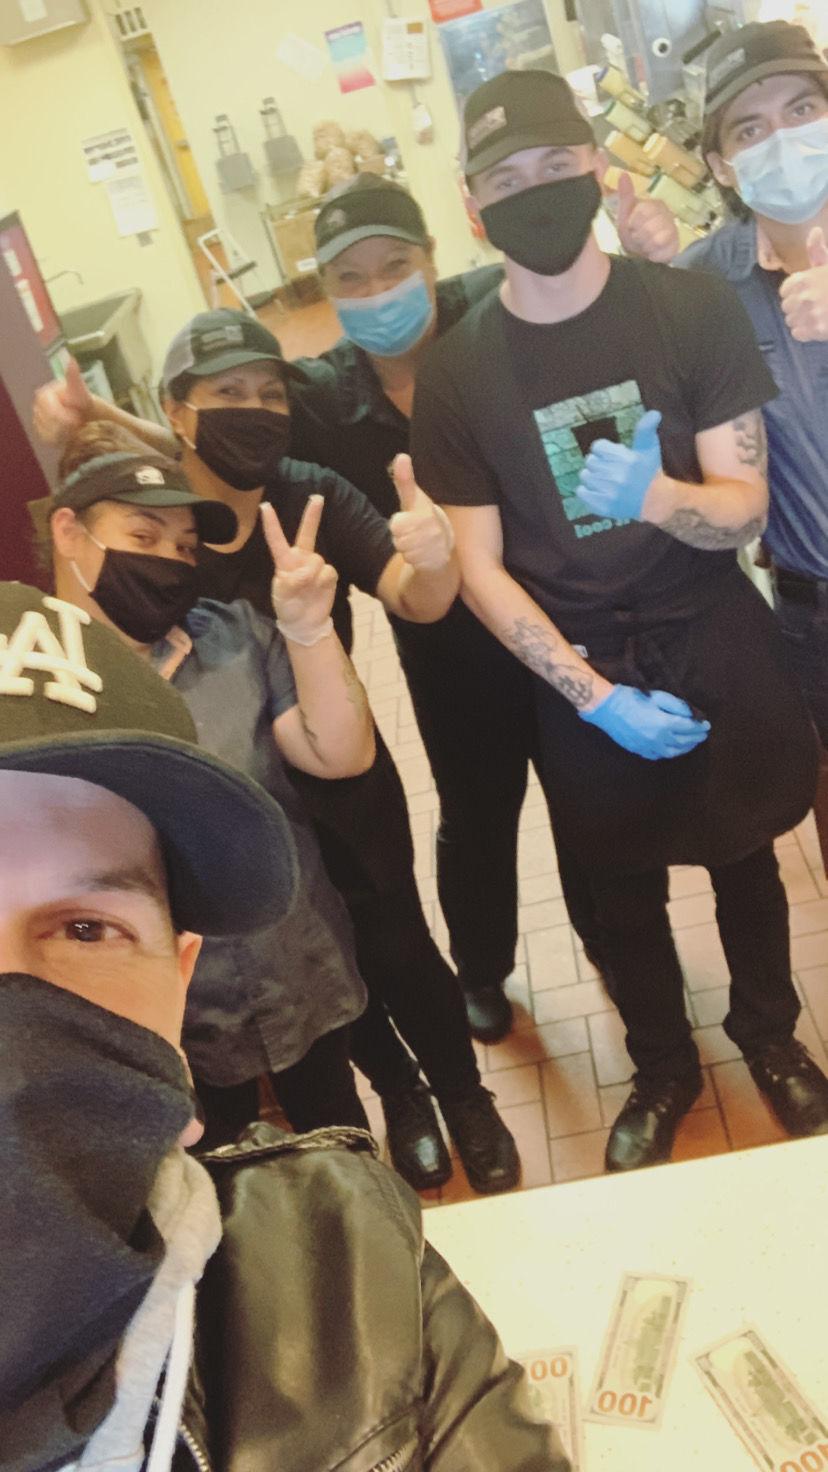 taco bell selfie